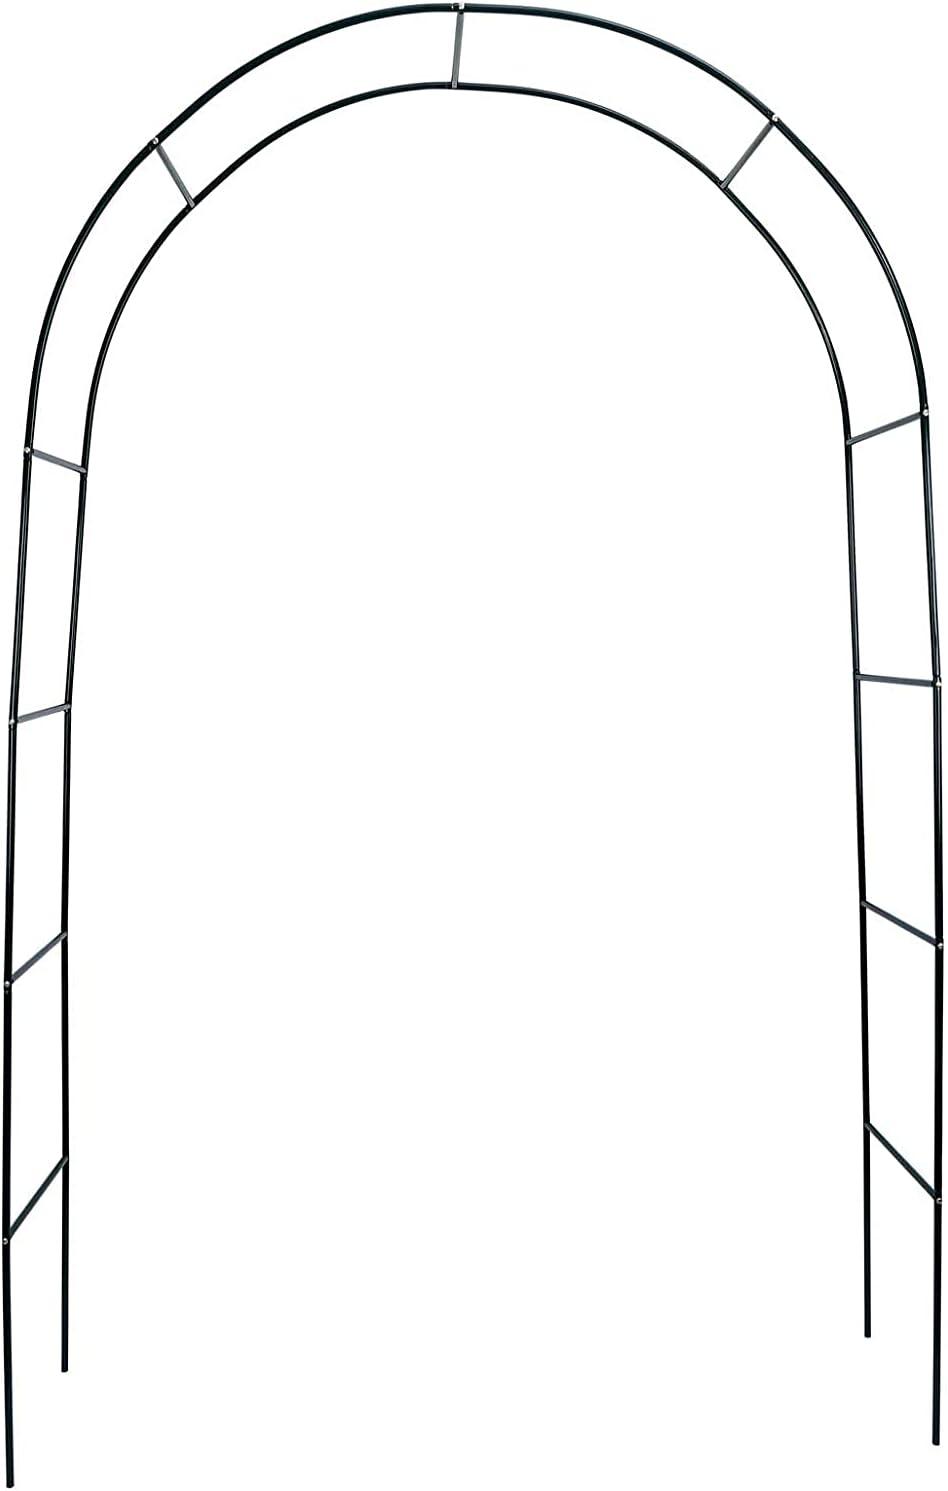 Atrusu Garden Arbors, 7.8 Ft Metal Arch with Lightweight, Pergola Arbor for Wedding, Garden, Party Decoration, Climbing Plant, Indoor Outdoor